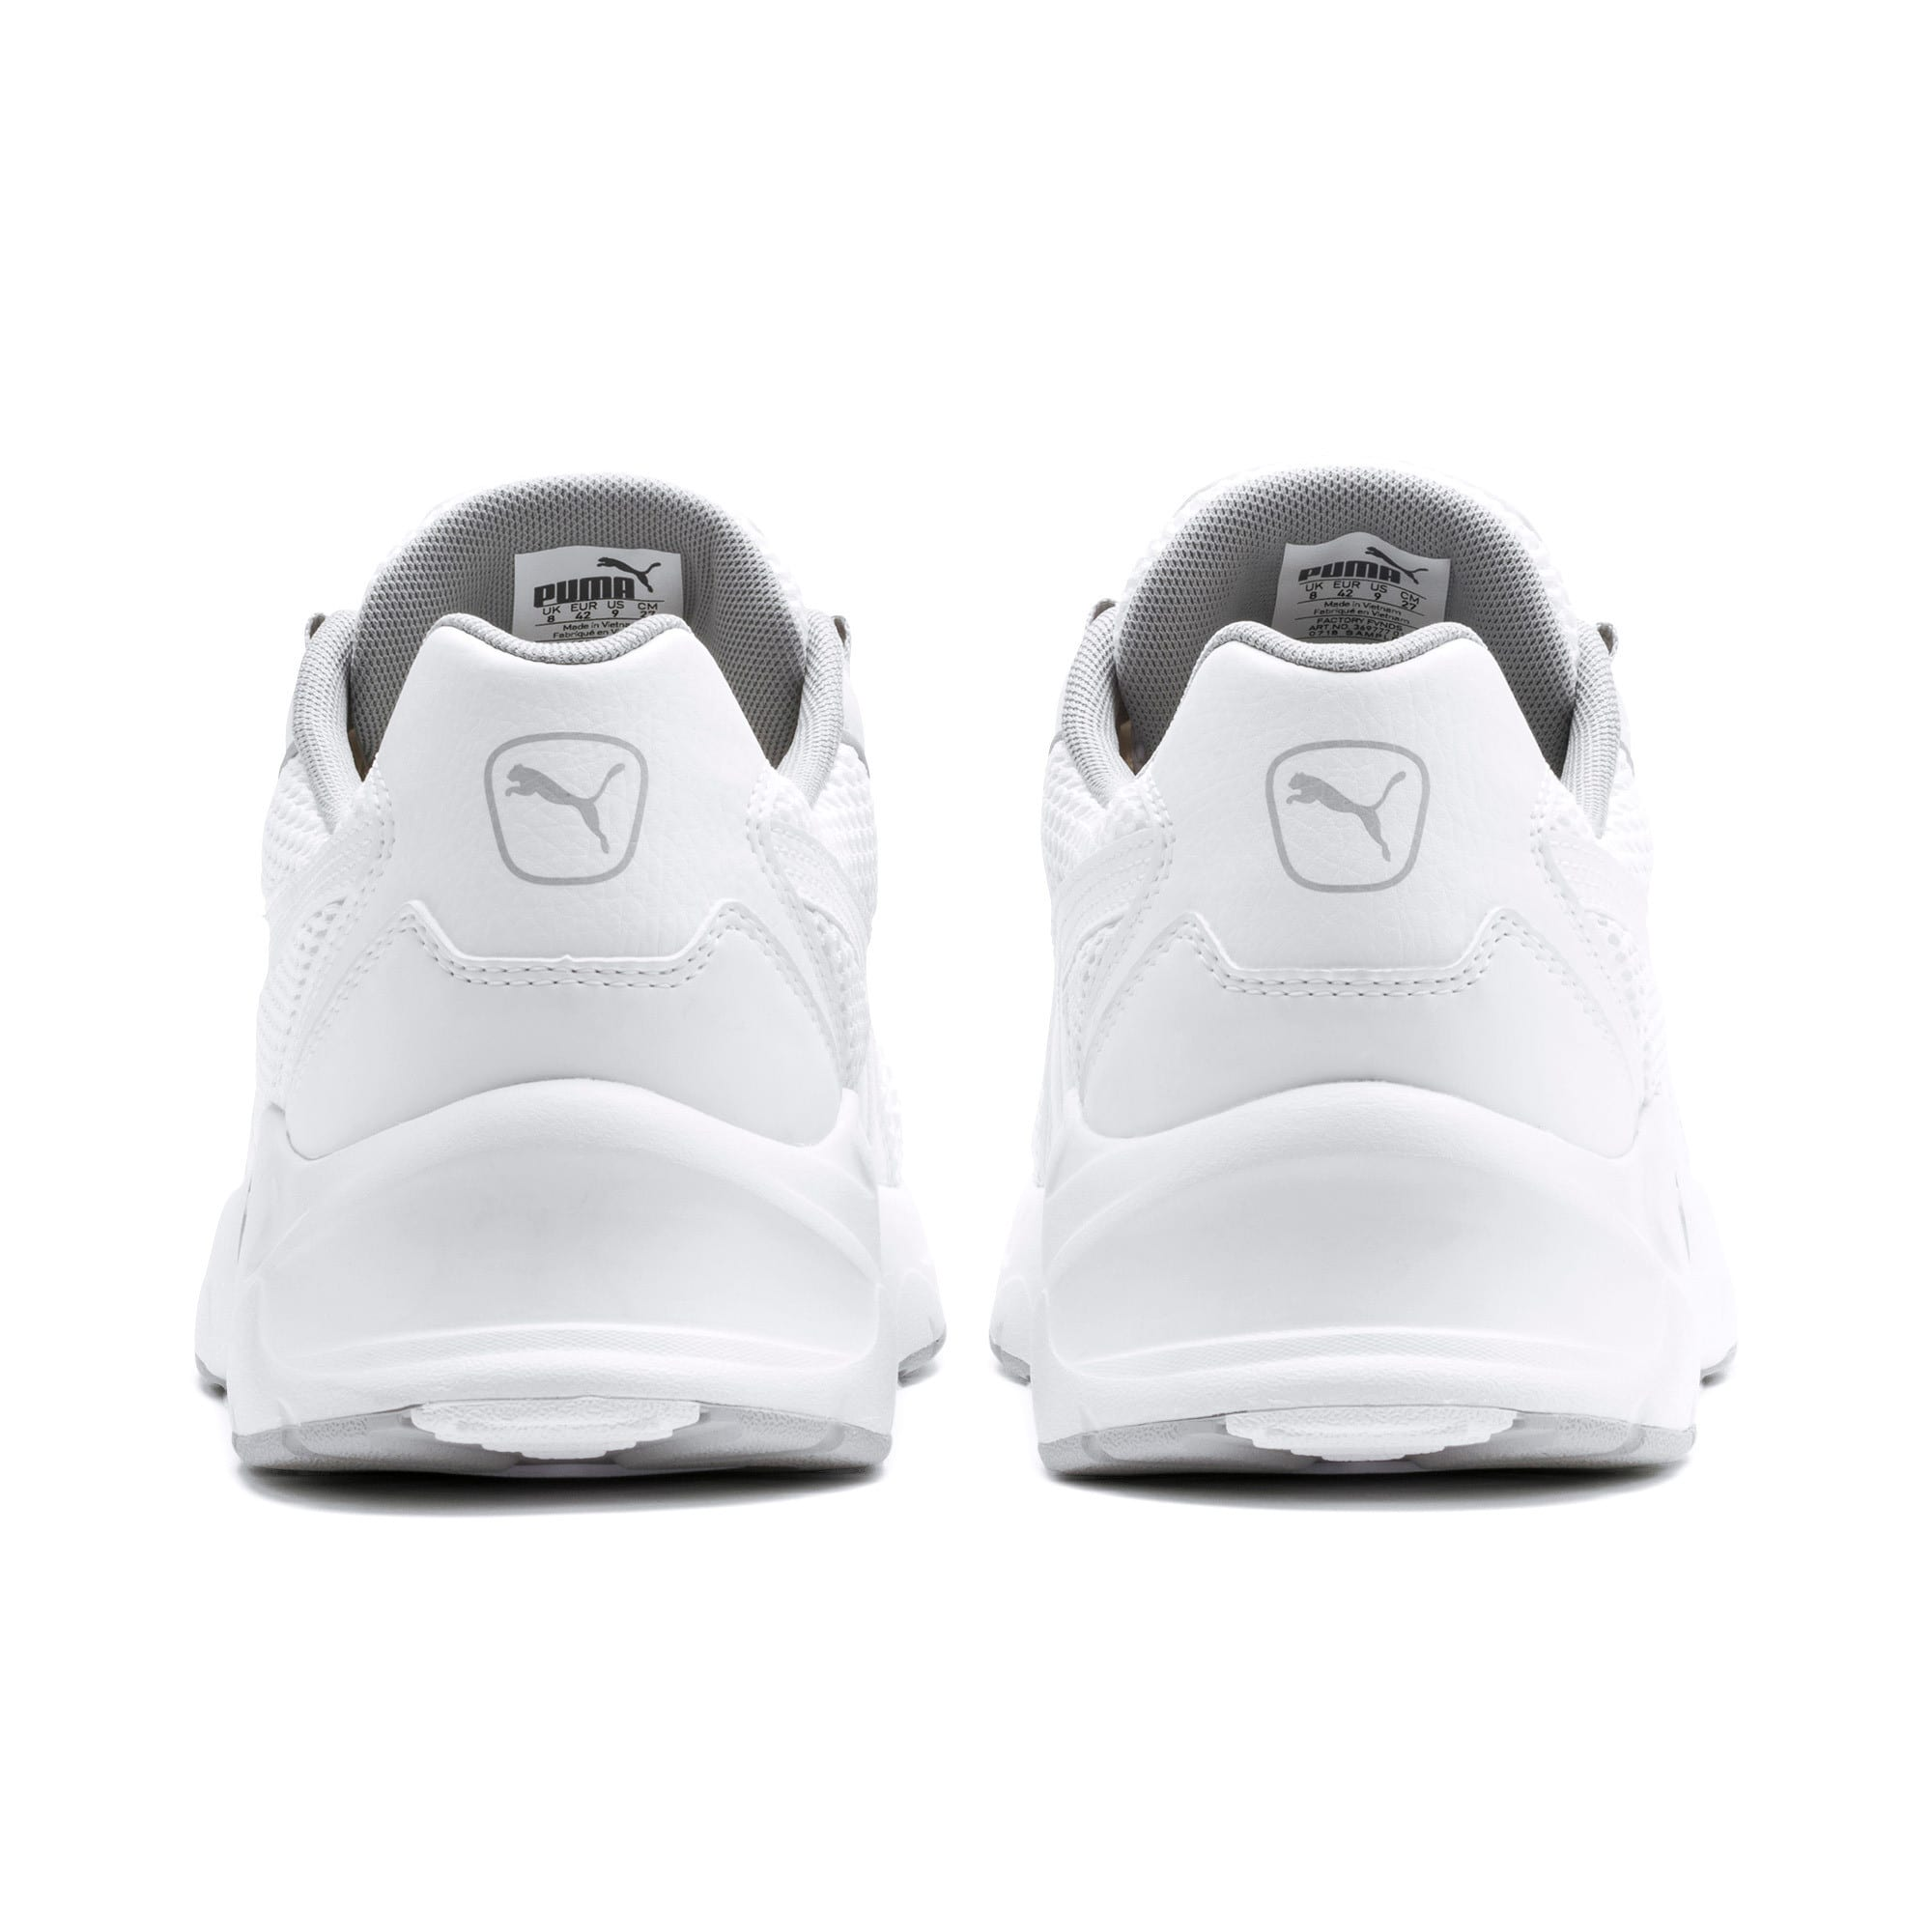 Thumbnail 4 of Nucleus Training Shoes, Puma White-High Rise, medium